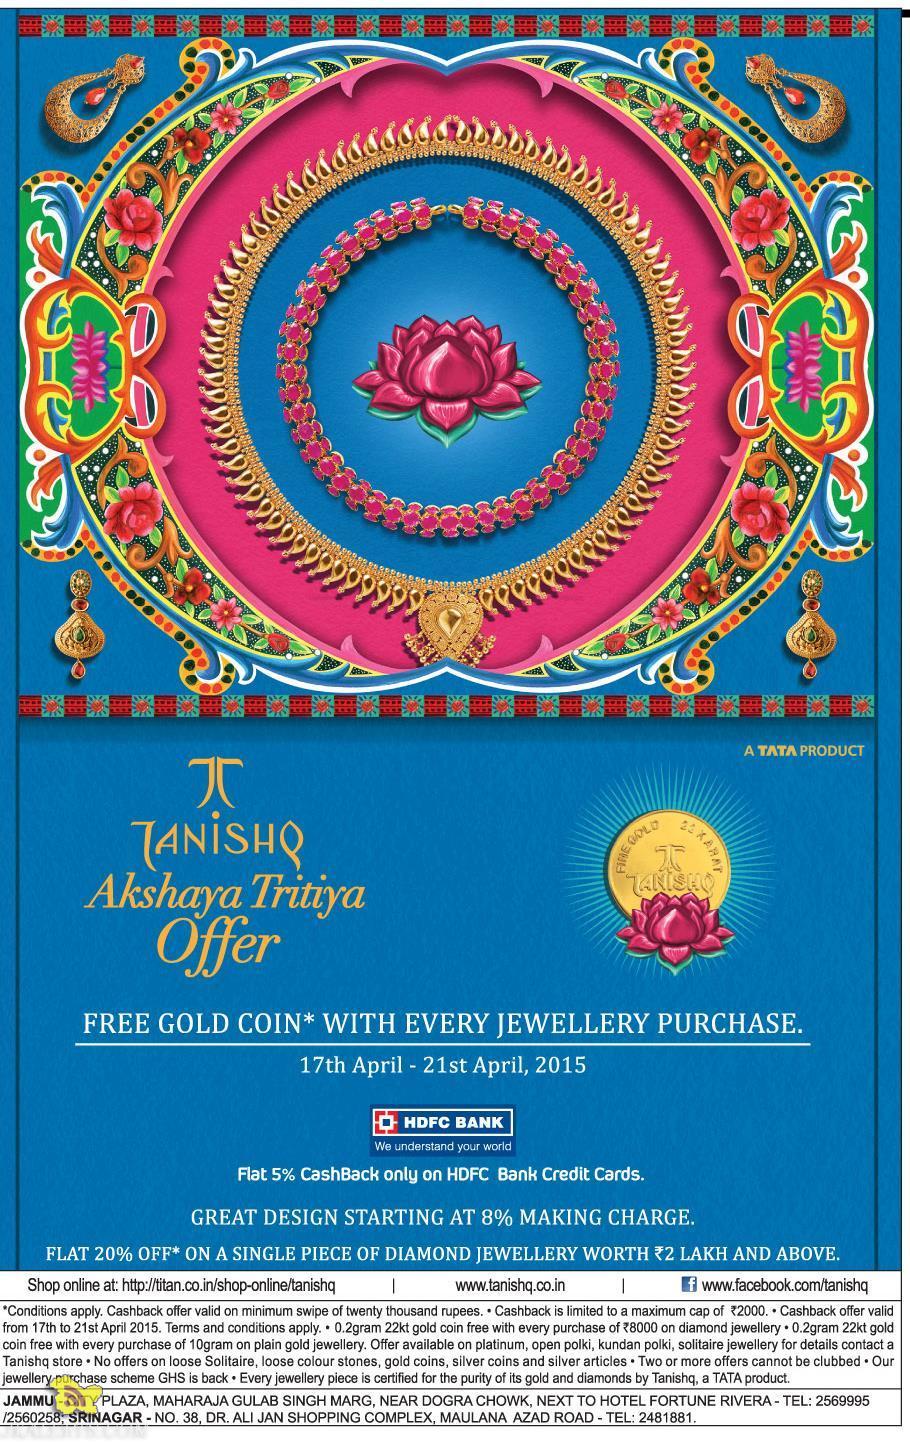 Tanishq Akshaya Tritiya offer on Gold and Diamond Jewellery